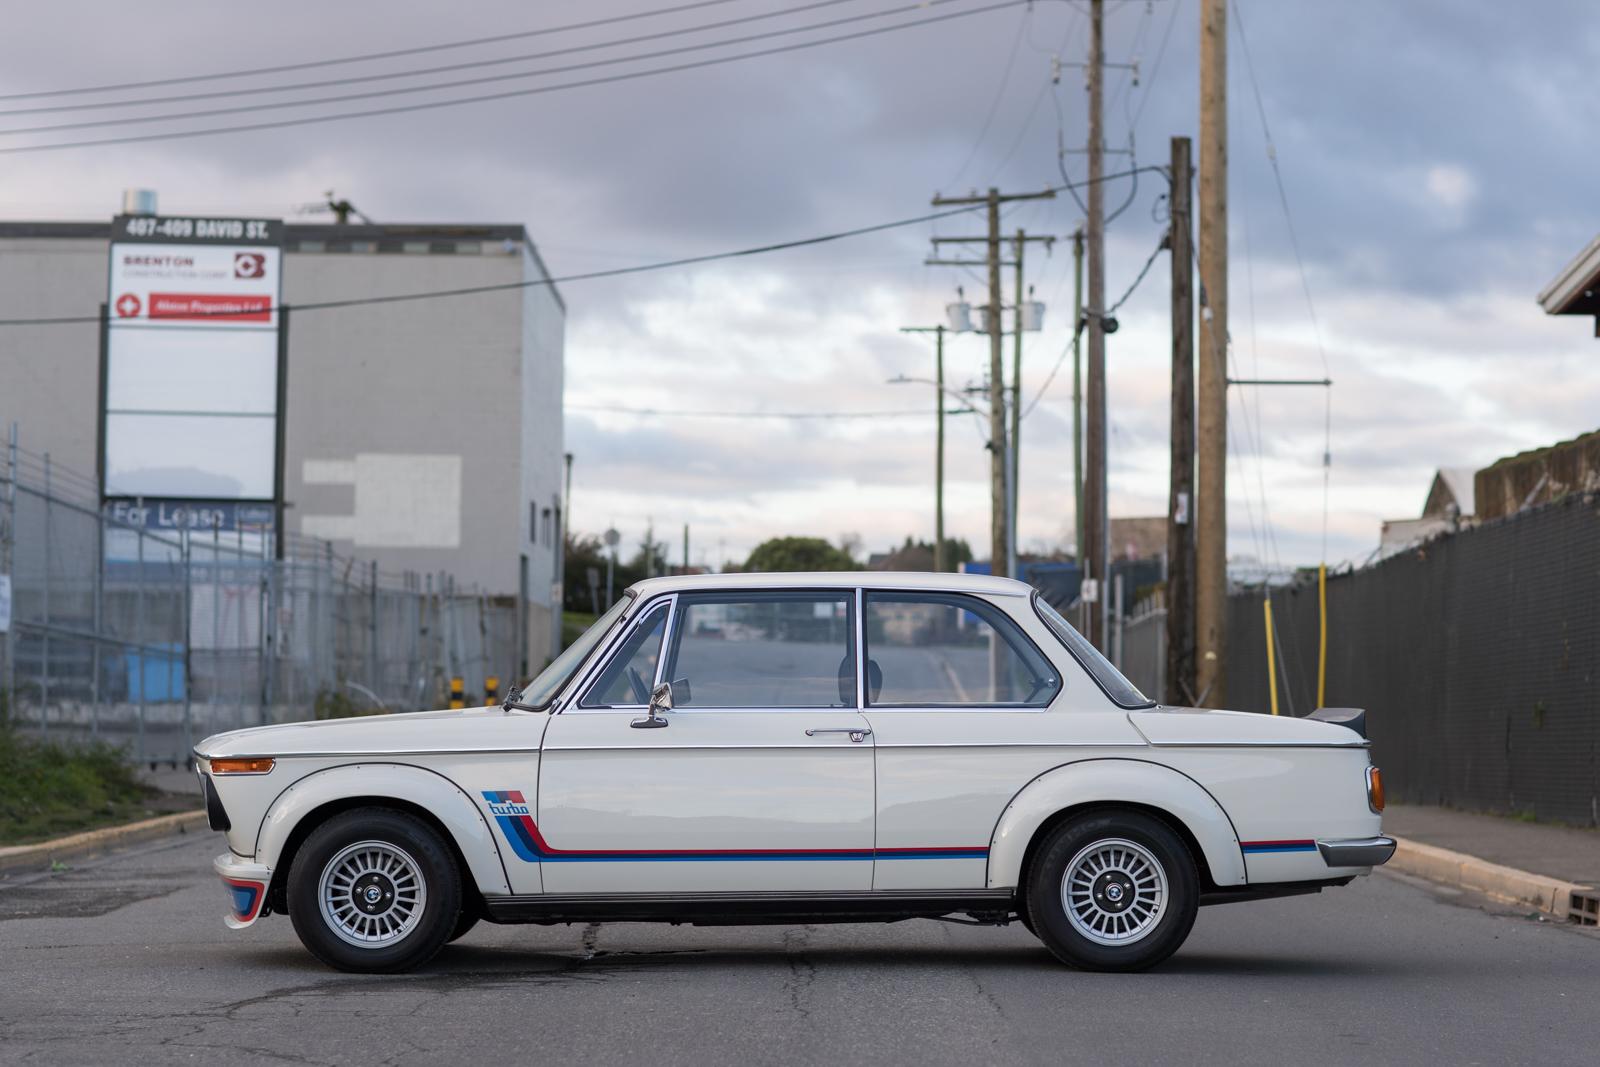 1974 BMW 2002 Turbo LH side